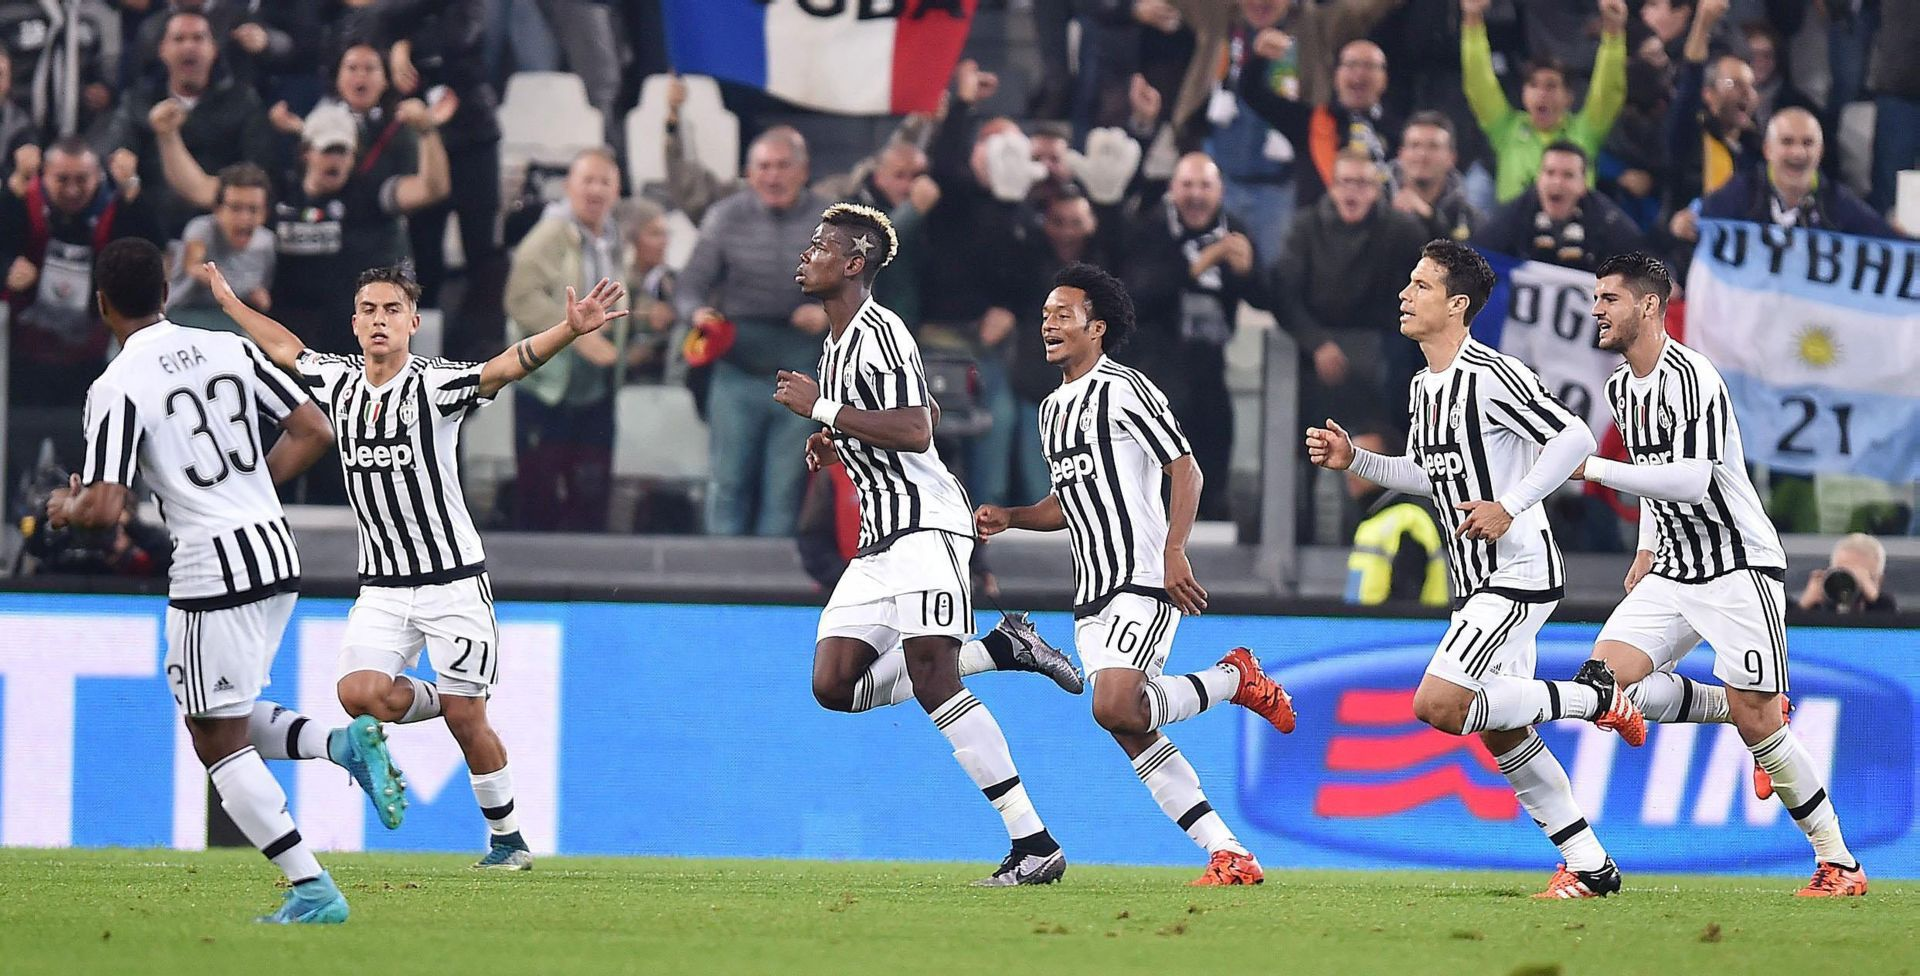 SERIE A Roma propustila preuzeti vrh, treća uzastopna pobjeda Juventusa